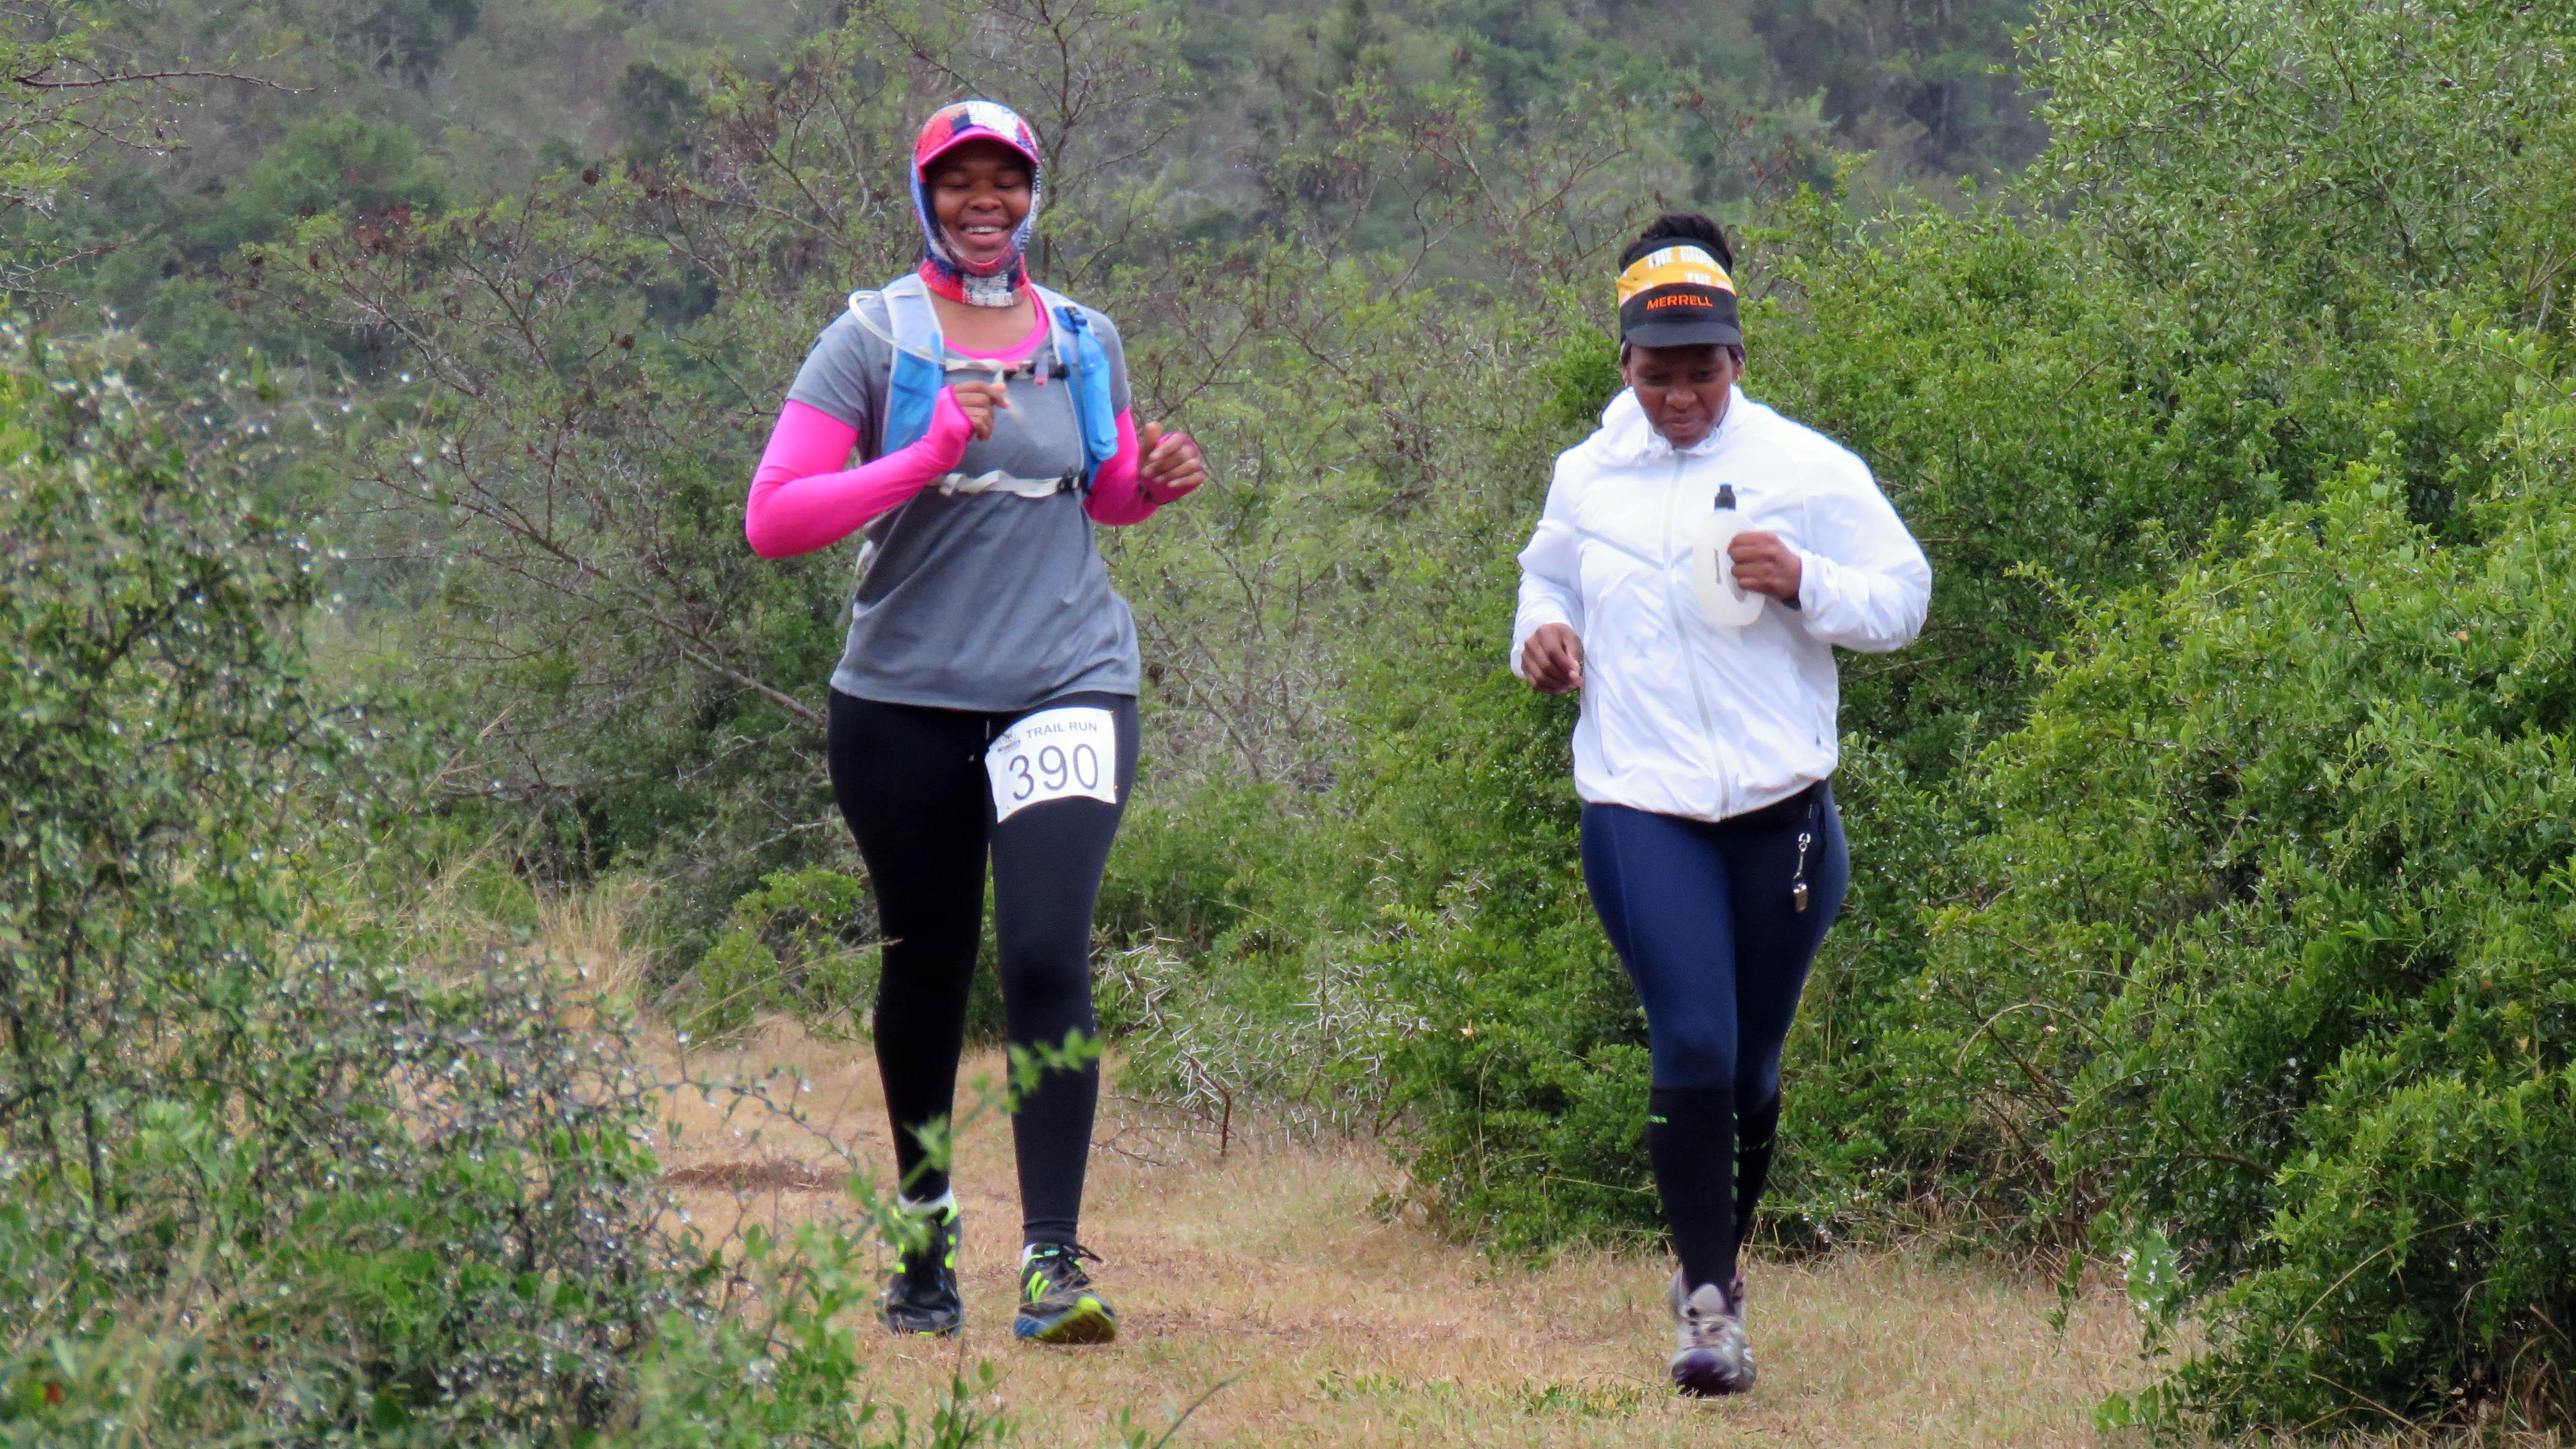 hayterdale trailrun 2018-08-05  (24)